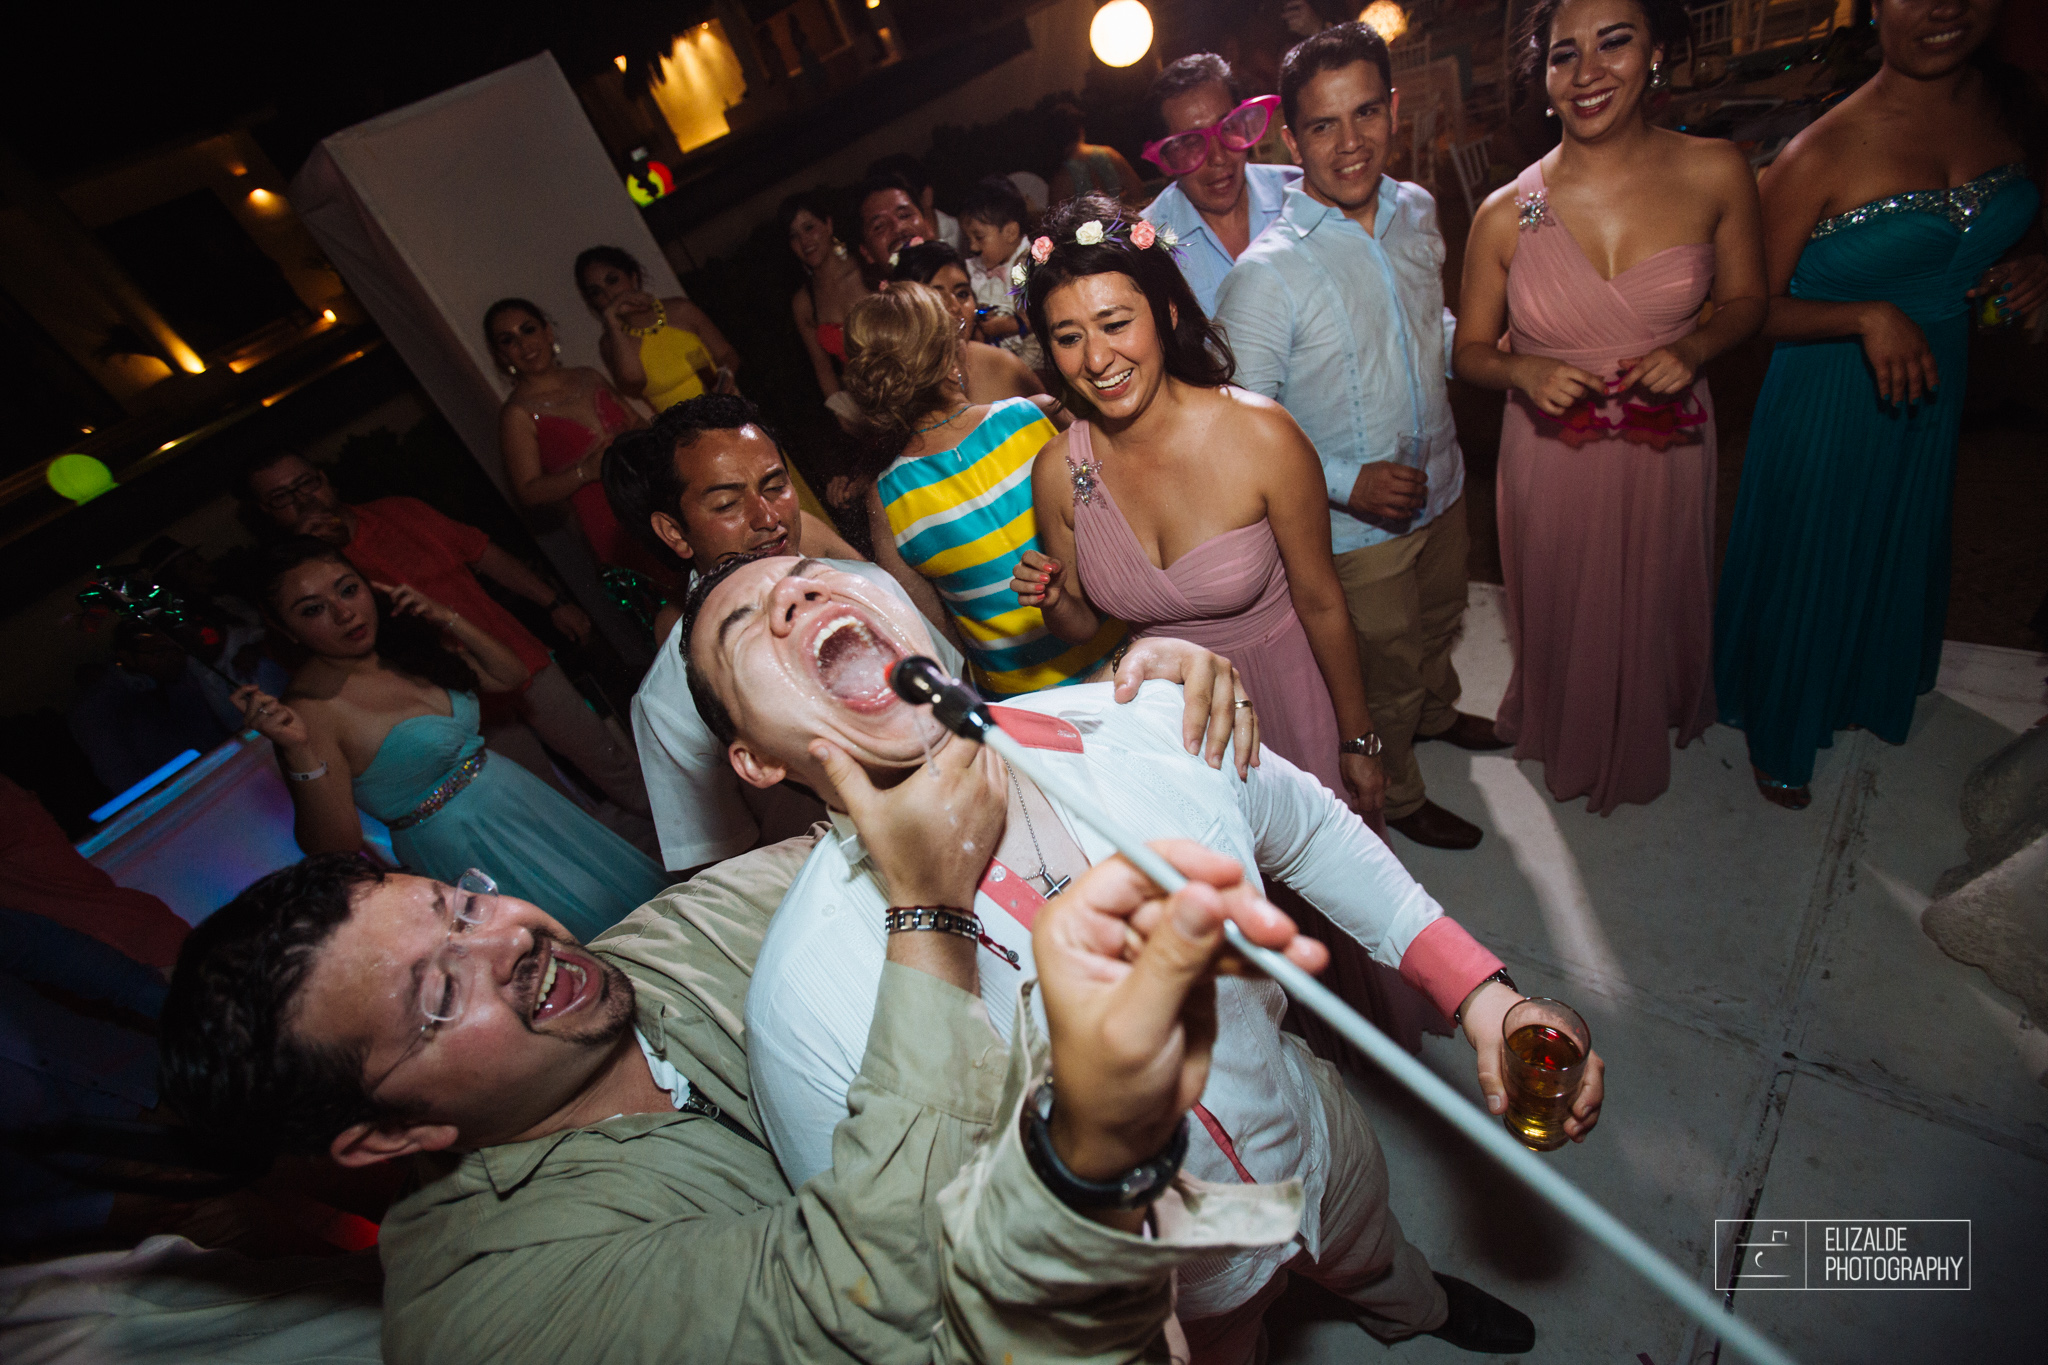 Pay and Ferran_Acapulco_Destination Wedding_Elizalde Photography-137.jpg